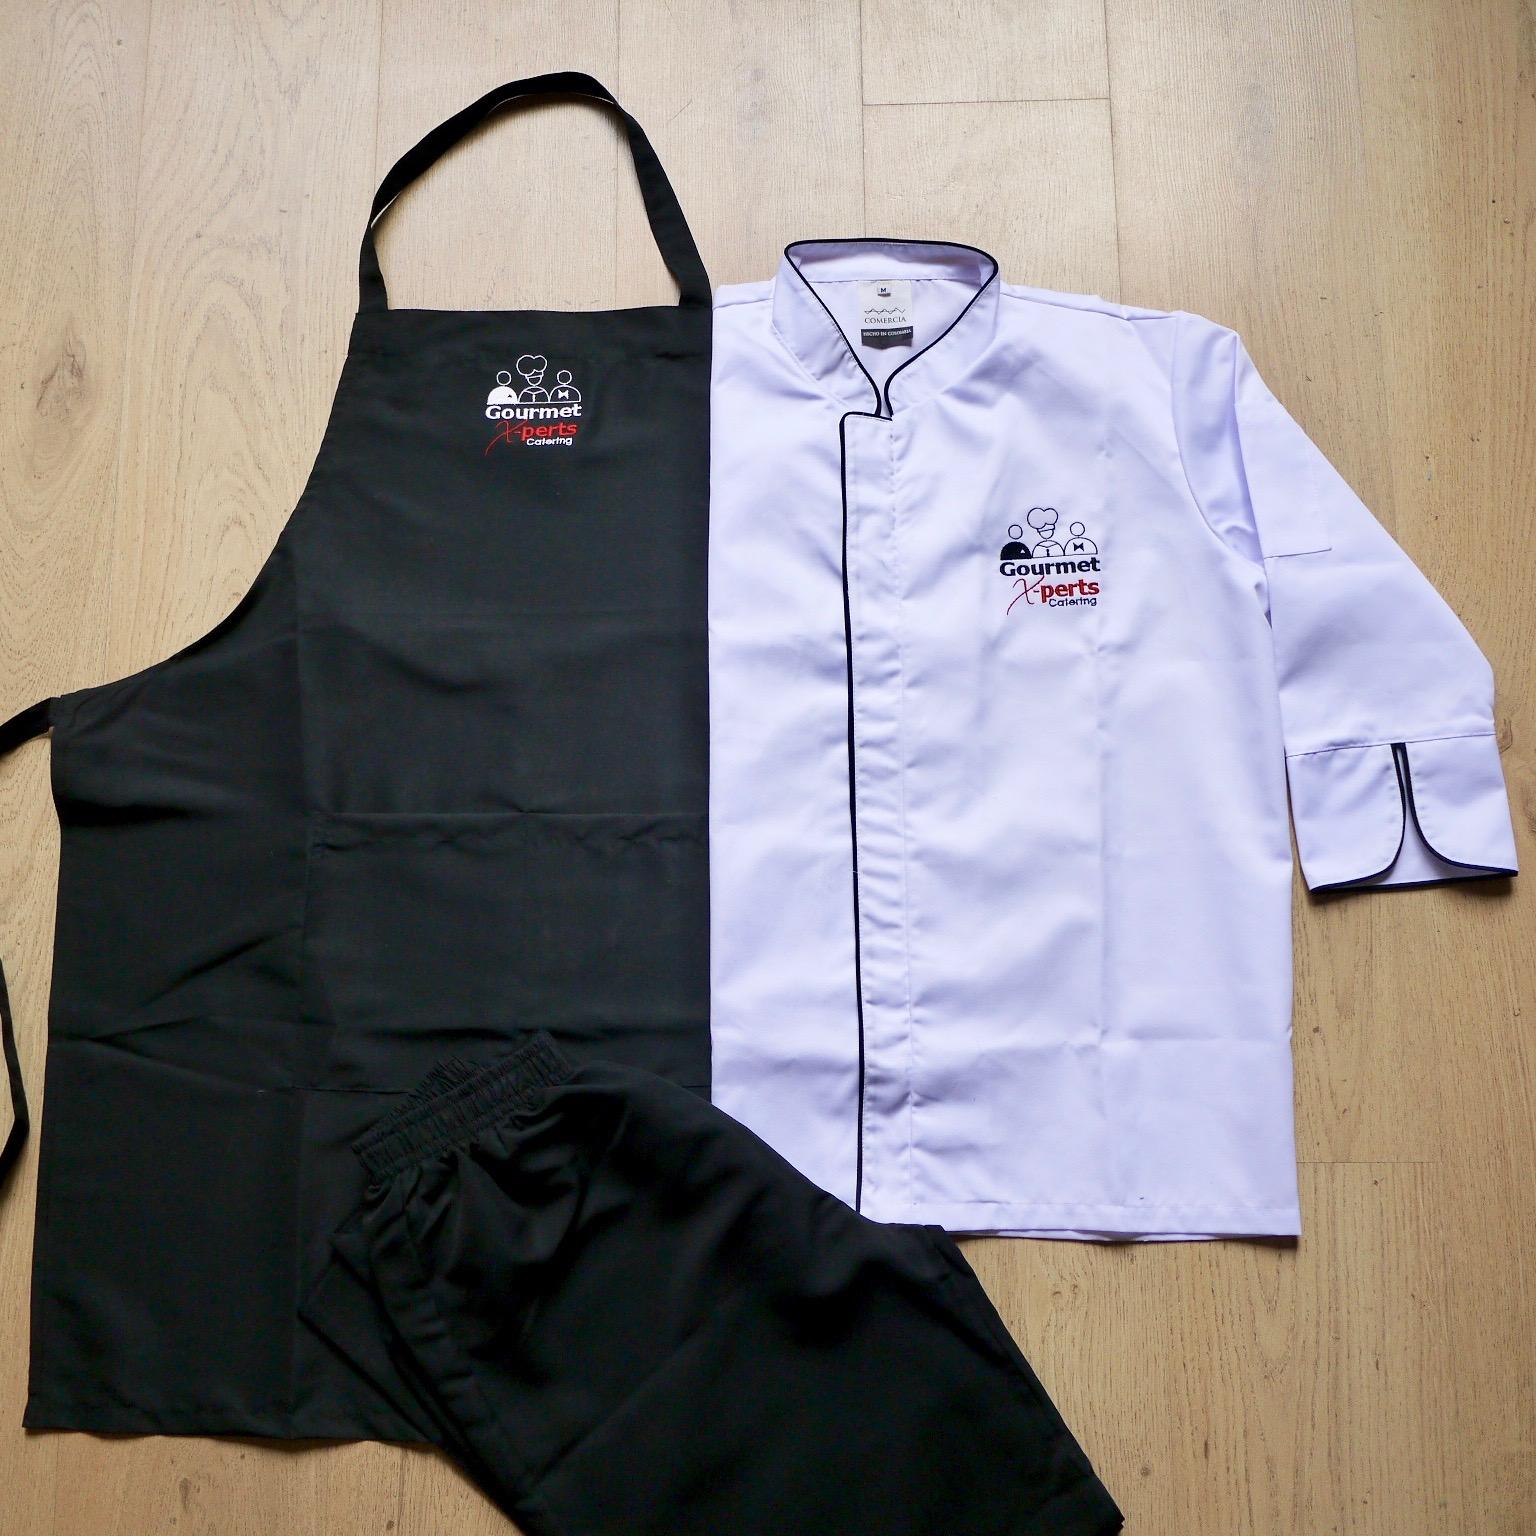 Dotacion Uniformes de Cocina